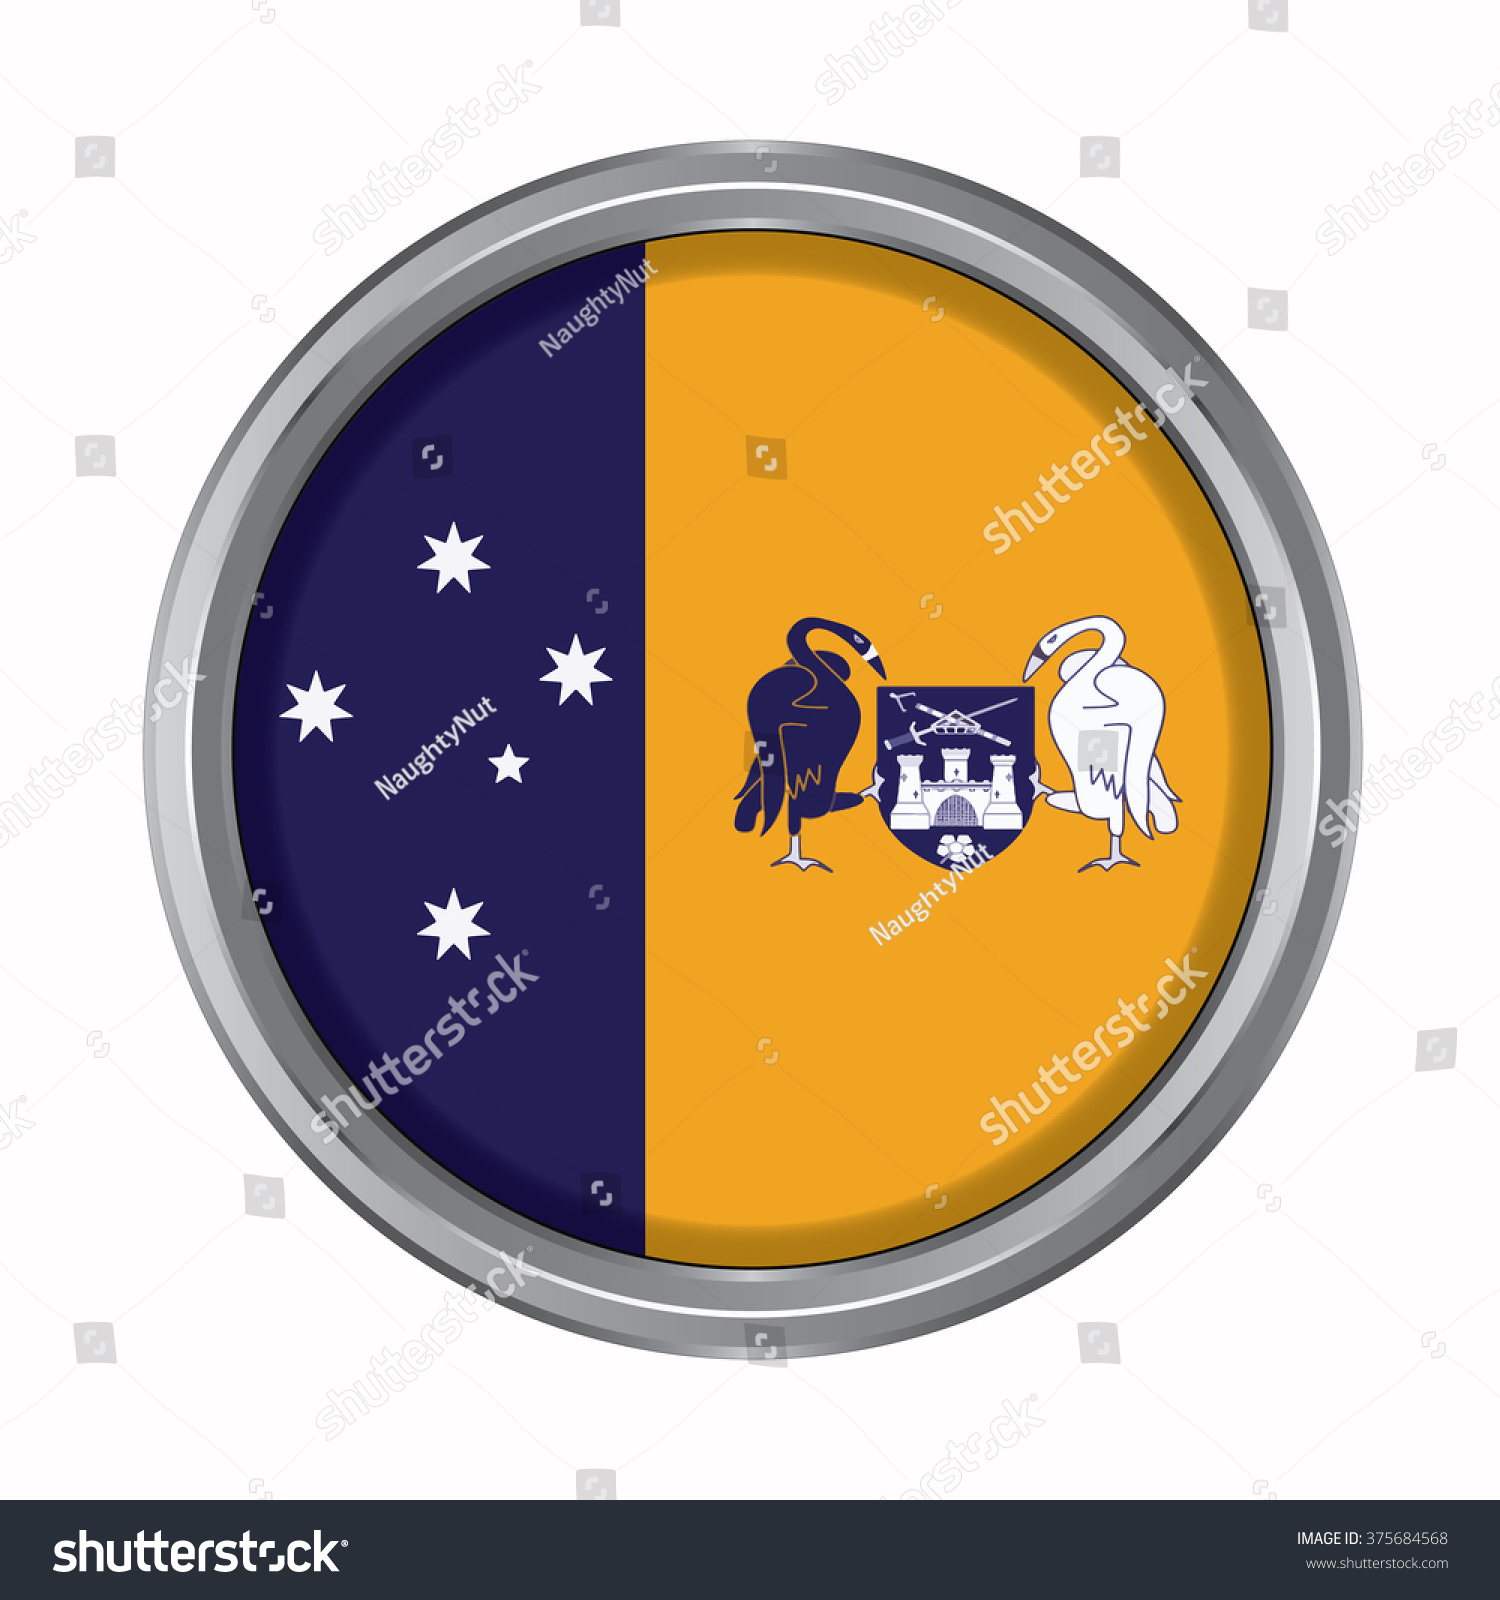 3d button flag australian capital territory stock vector 375684568 3d button flag of australian capital territory statesterritories of australia vector illustration biocorpaavc Choice Image